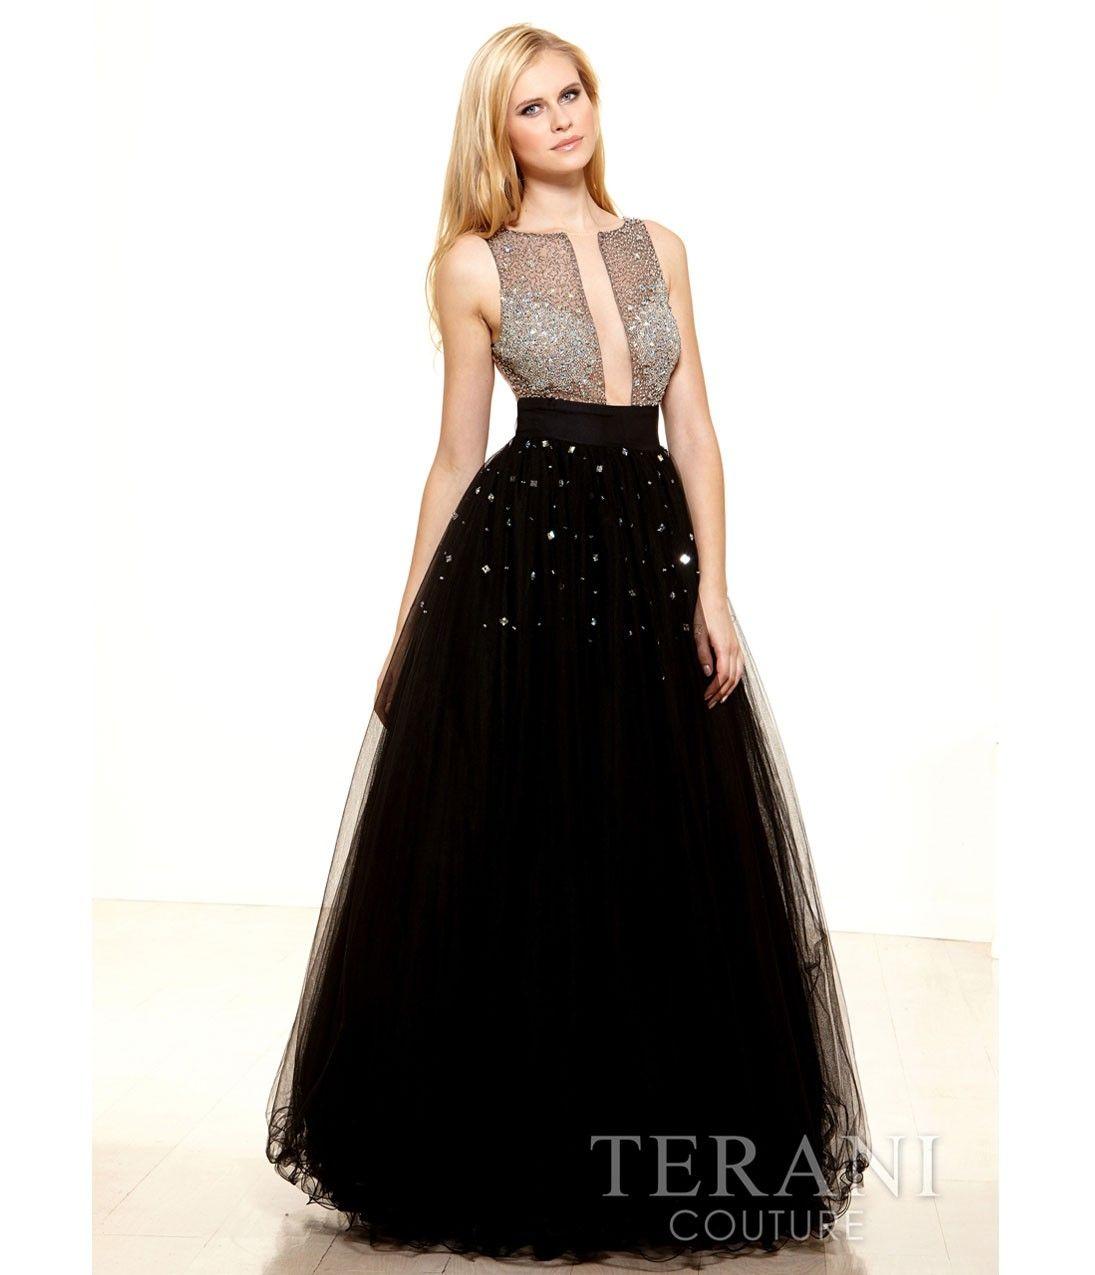 Terani prom dresses black mesh u crystal center cut out ball